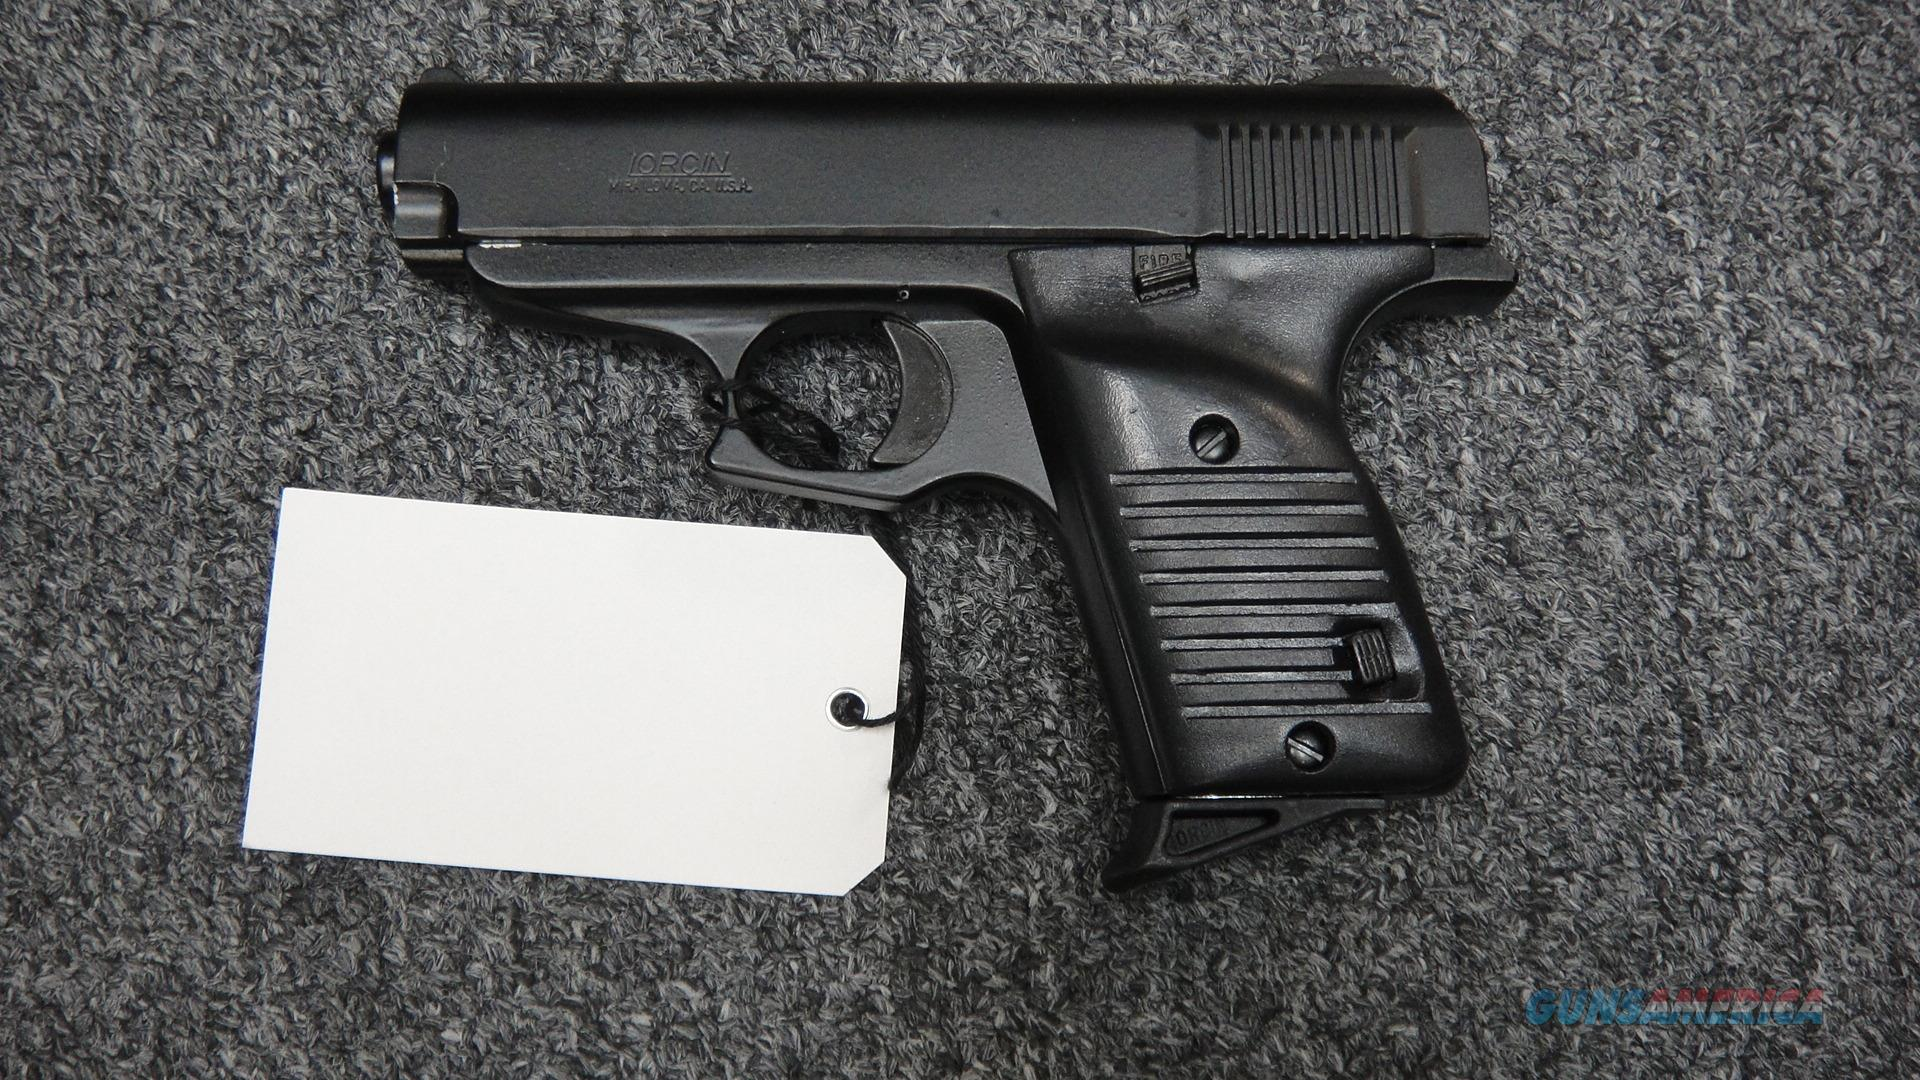 Lorcin L380 .380ACP--used  Guns > Pistols > Lorcin Pistols